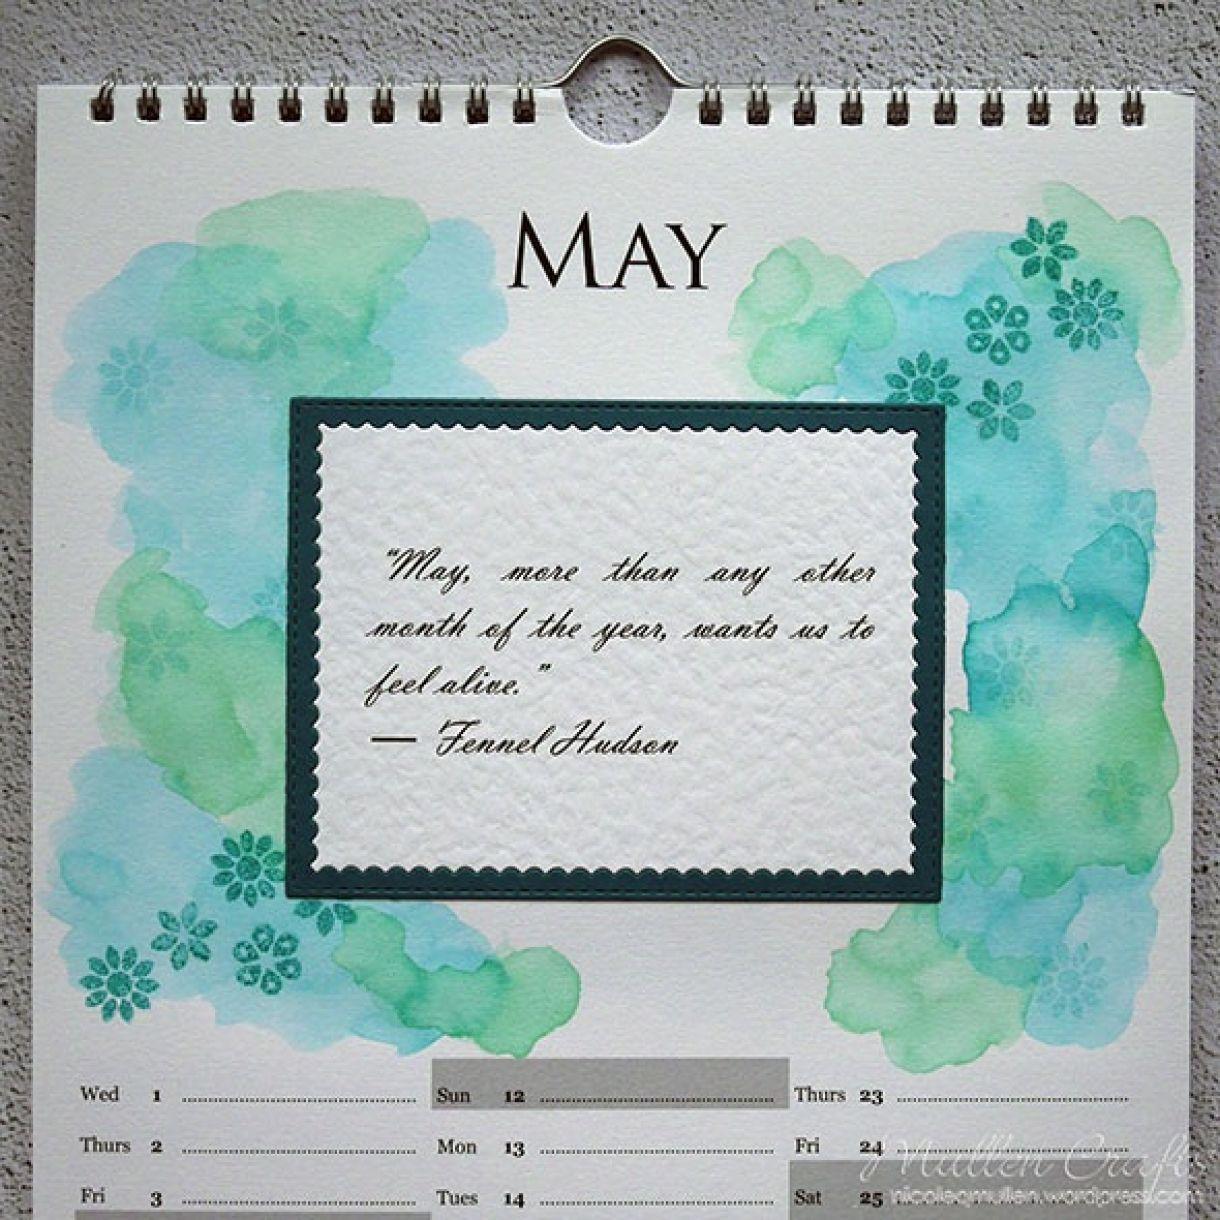 Nicole Calendar Page May 2